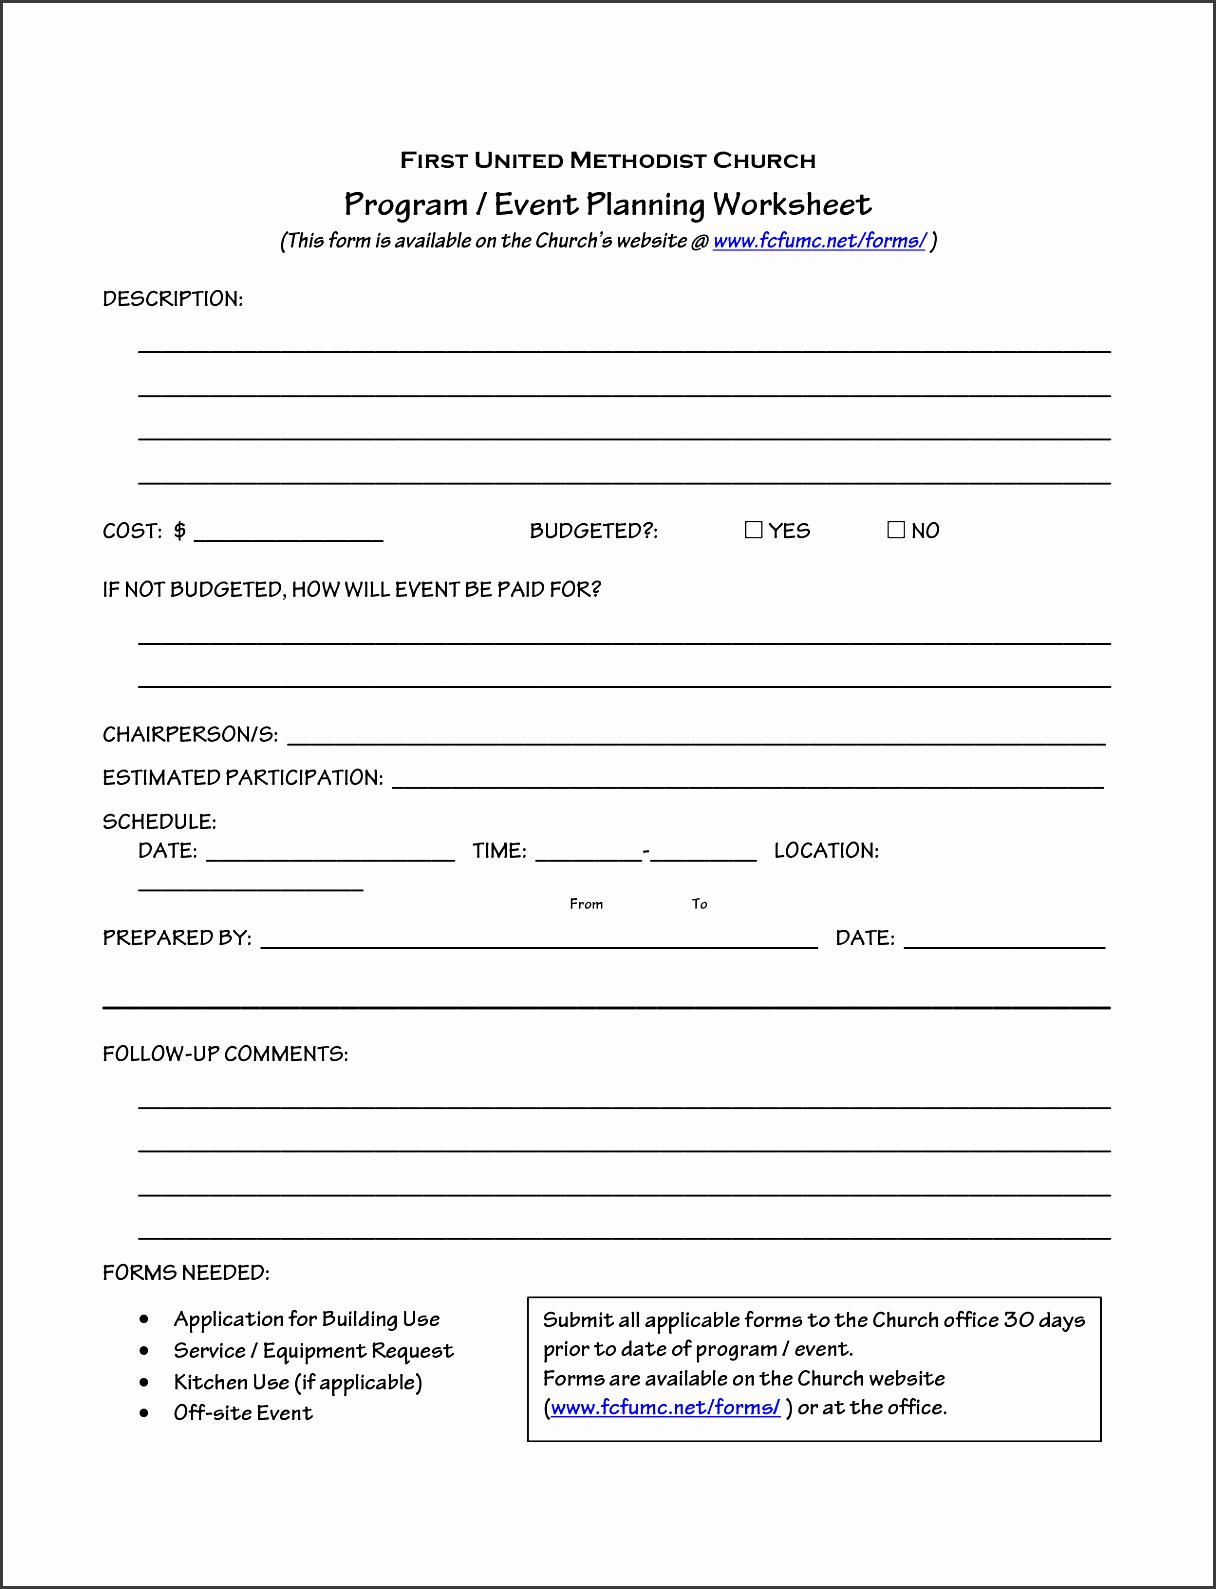 Funeral Planning Checklist Template Fresh 11 Funeral Planning Checklist Template In Excel